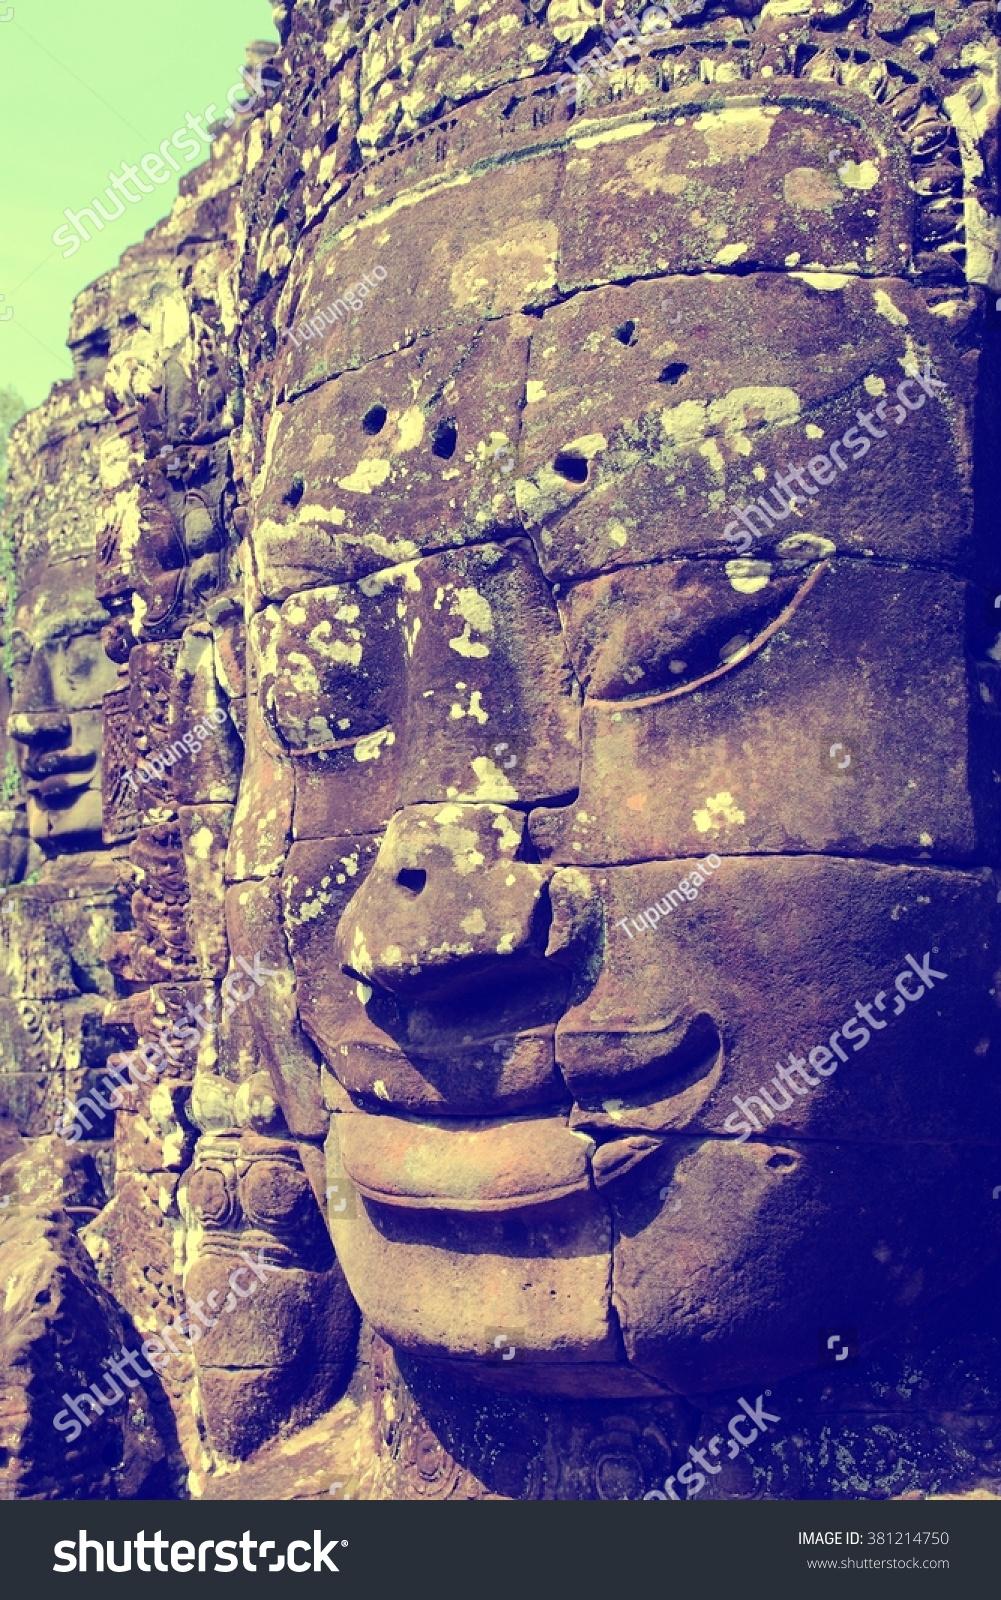 stock-photo-bayon-temple-cambodia-landma